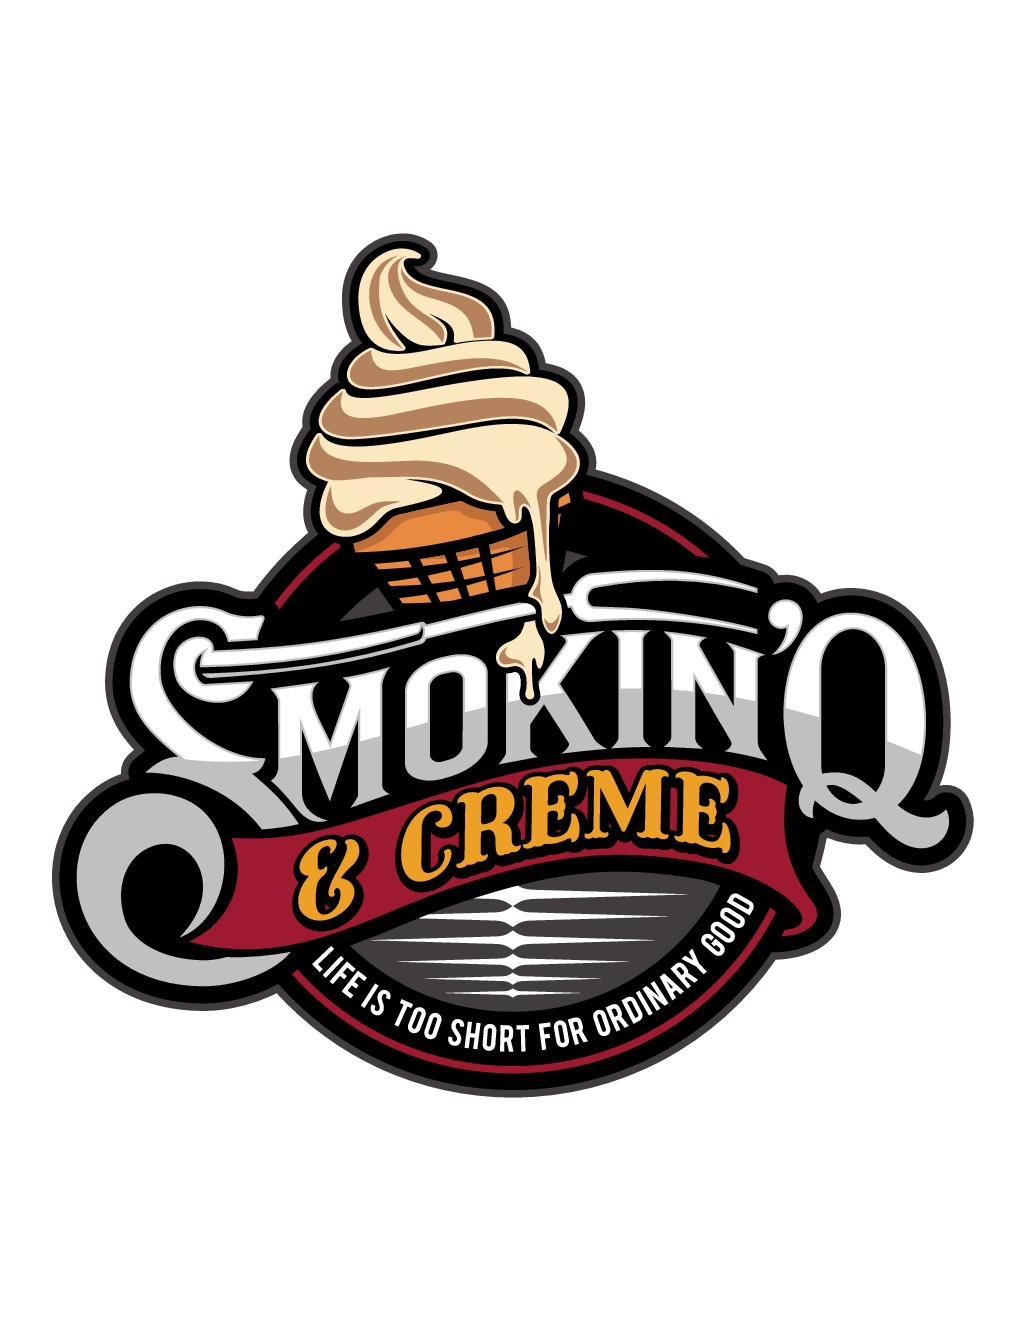 BBQ & Ice Cream Food trailer needs a new logo identity